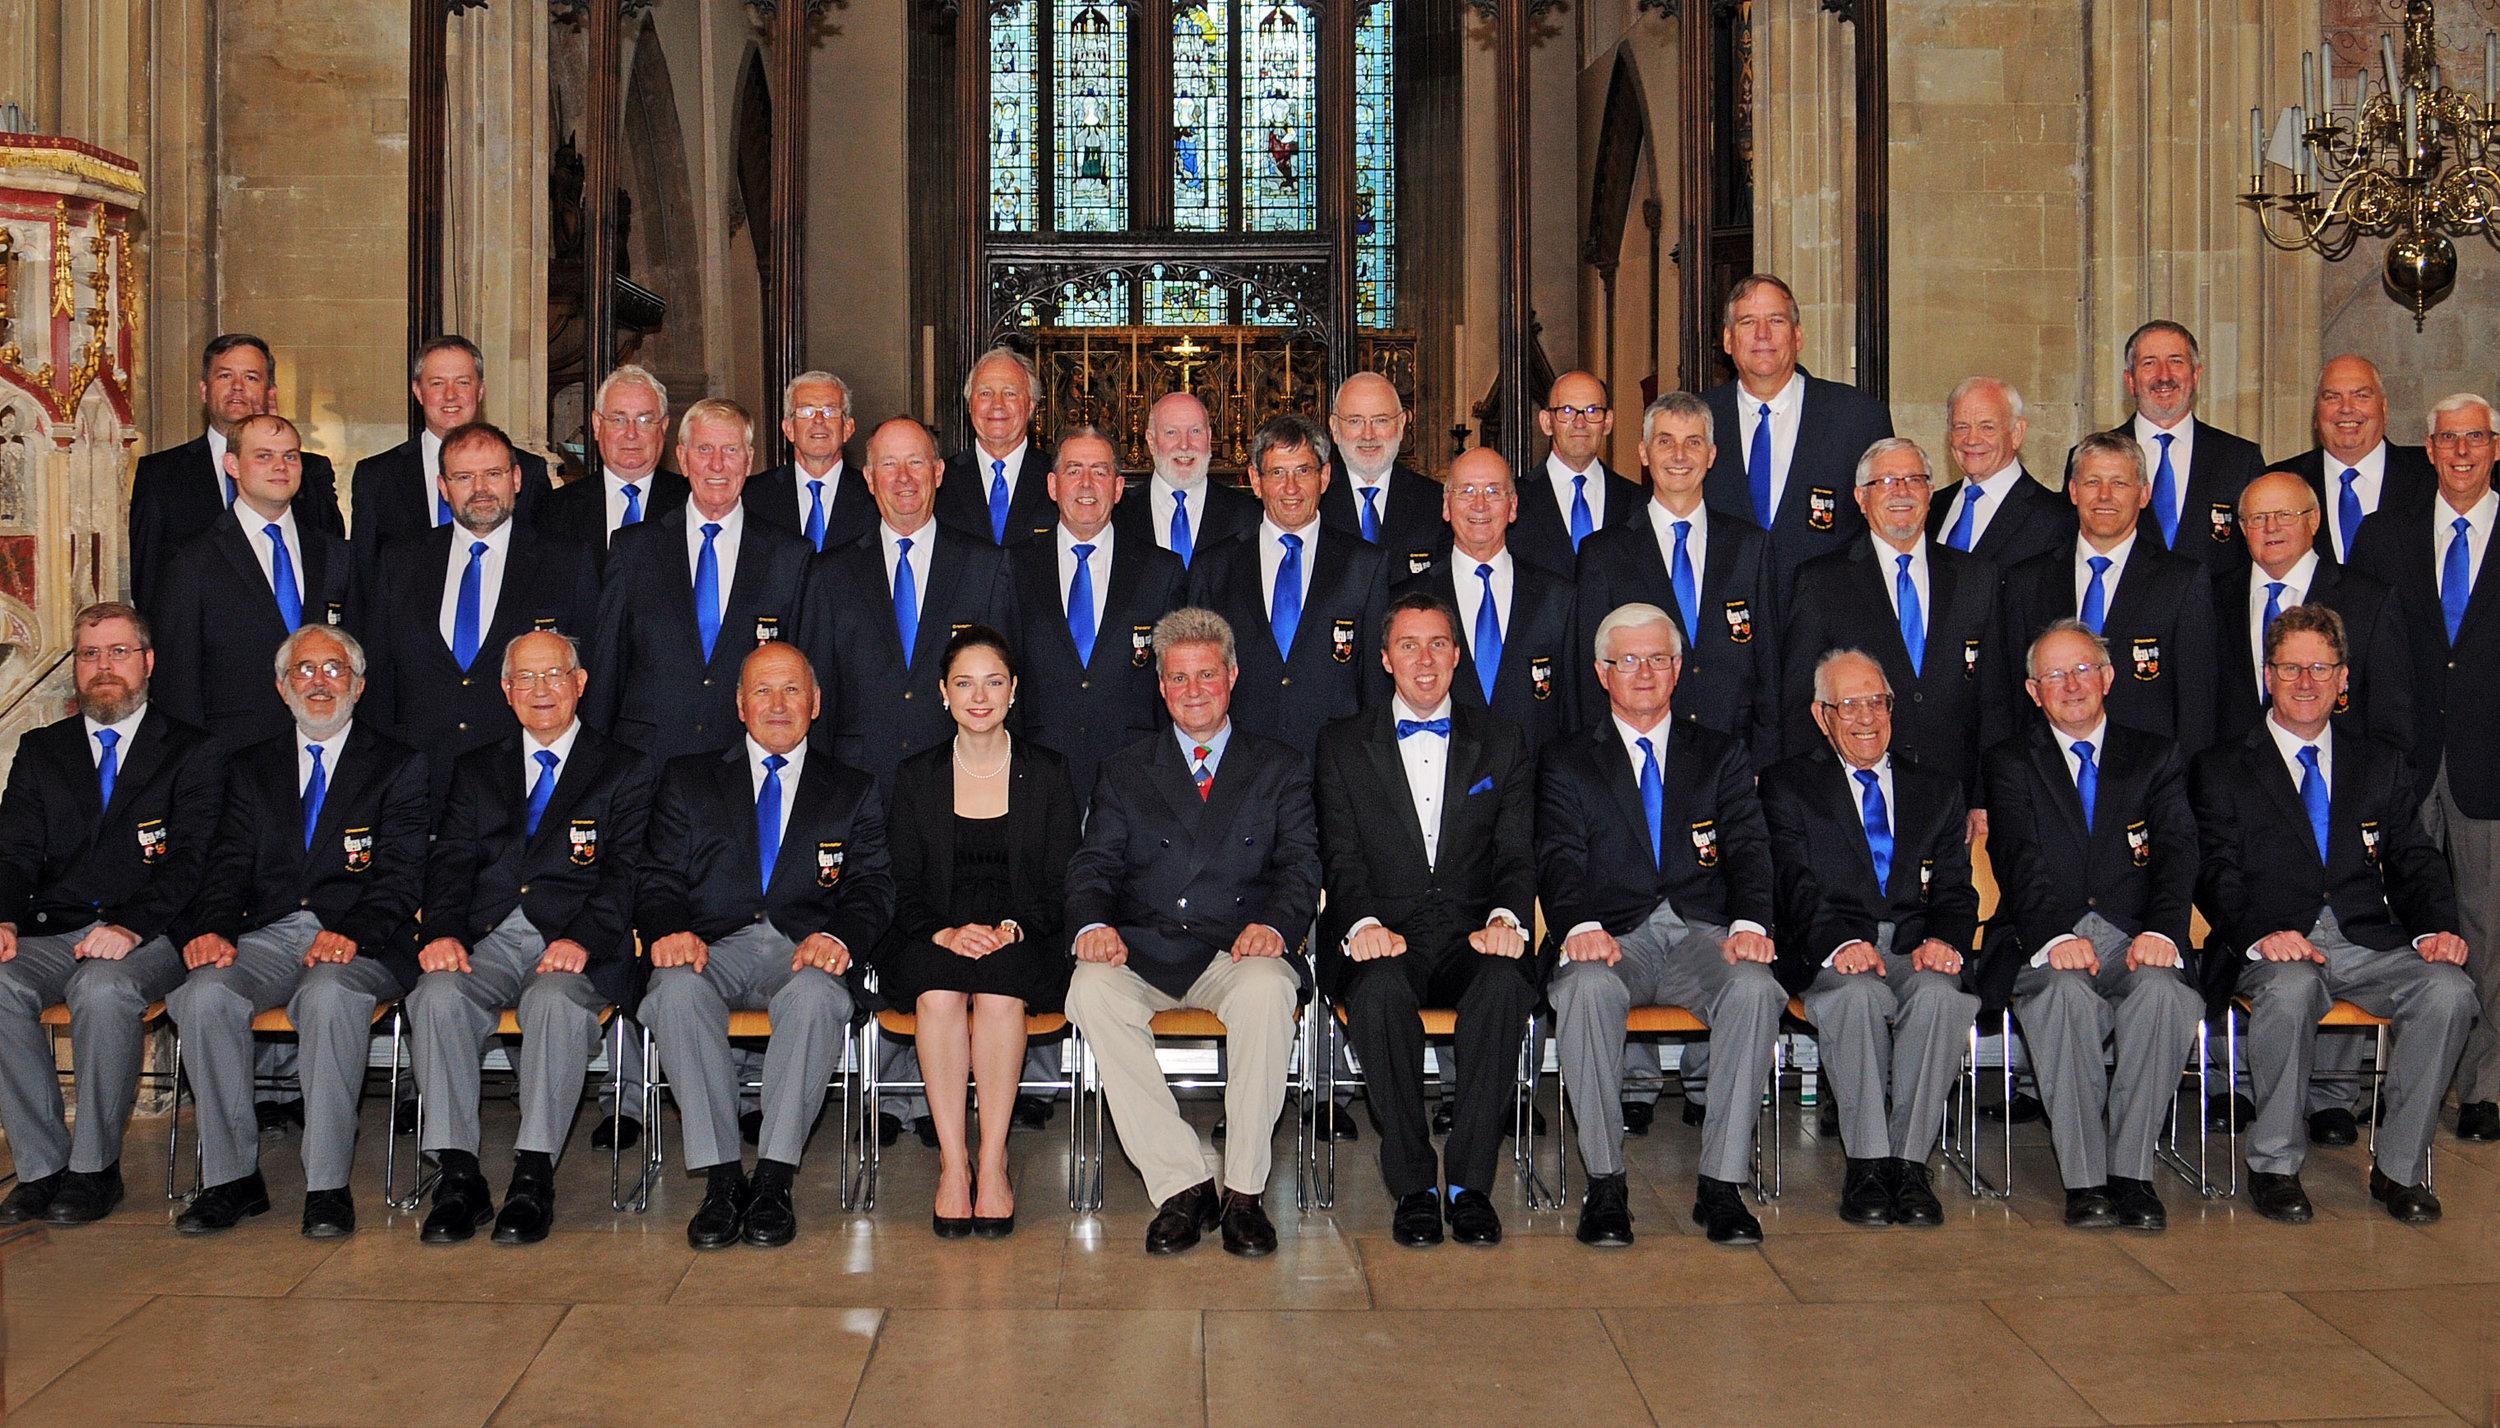 Choir 2 June 17th 2017 PModded.jpg